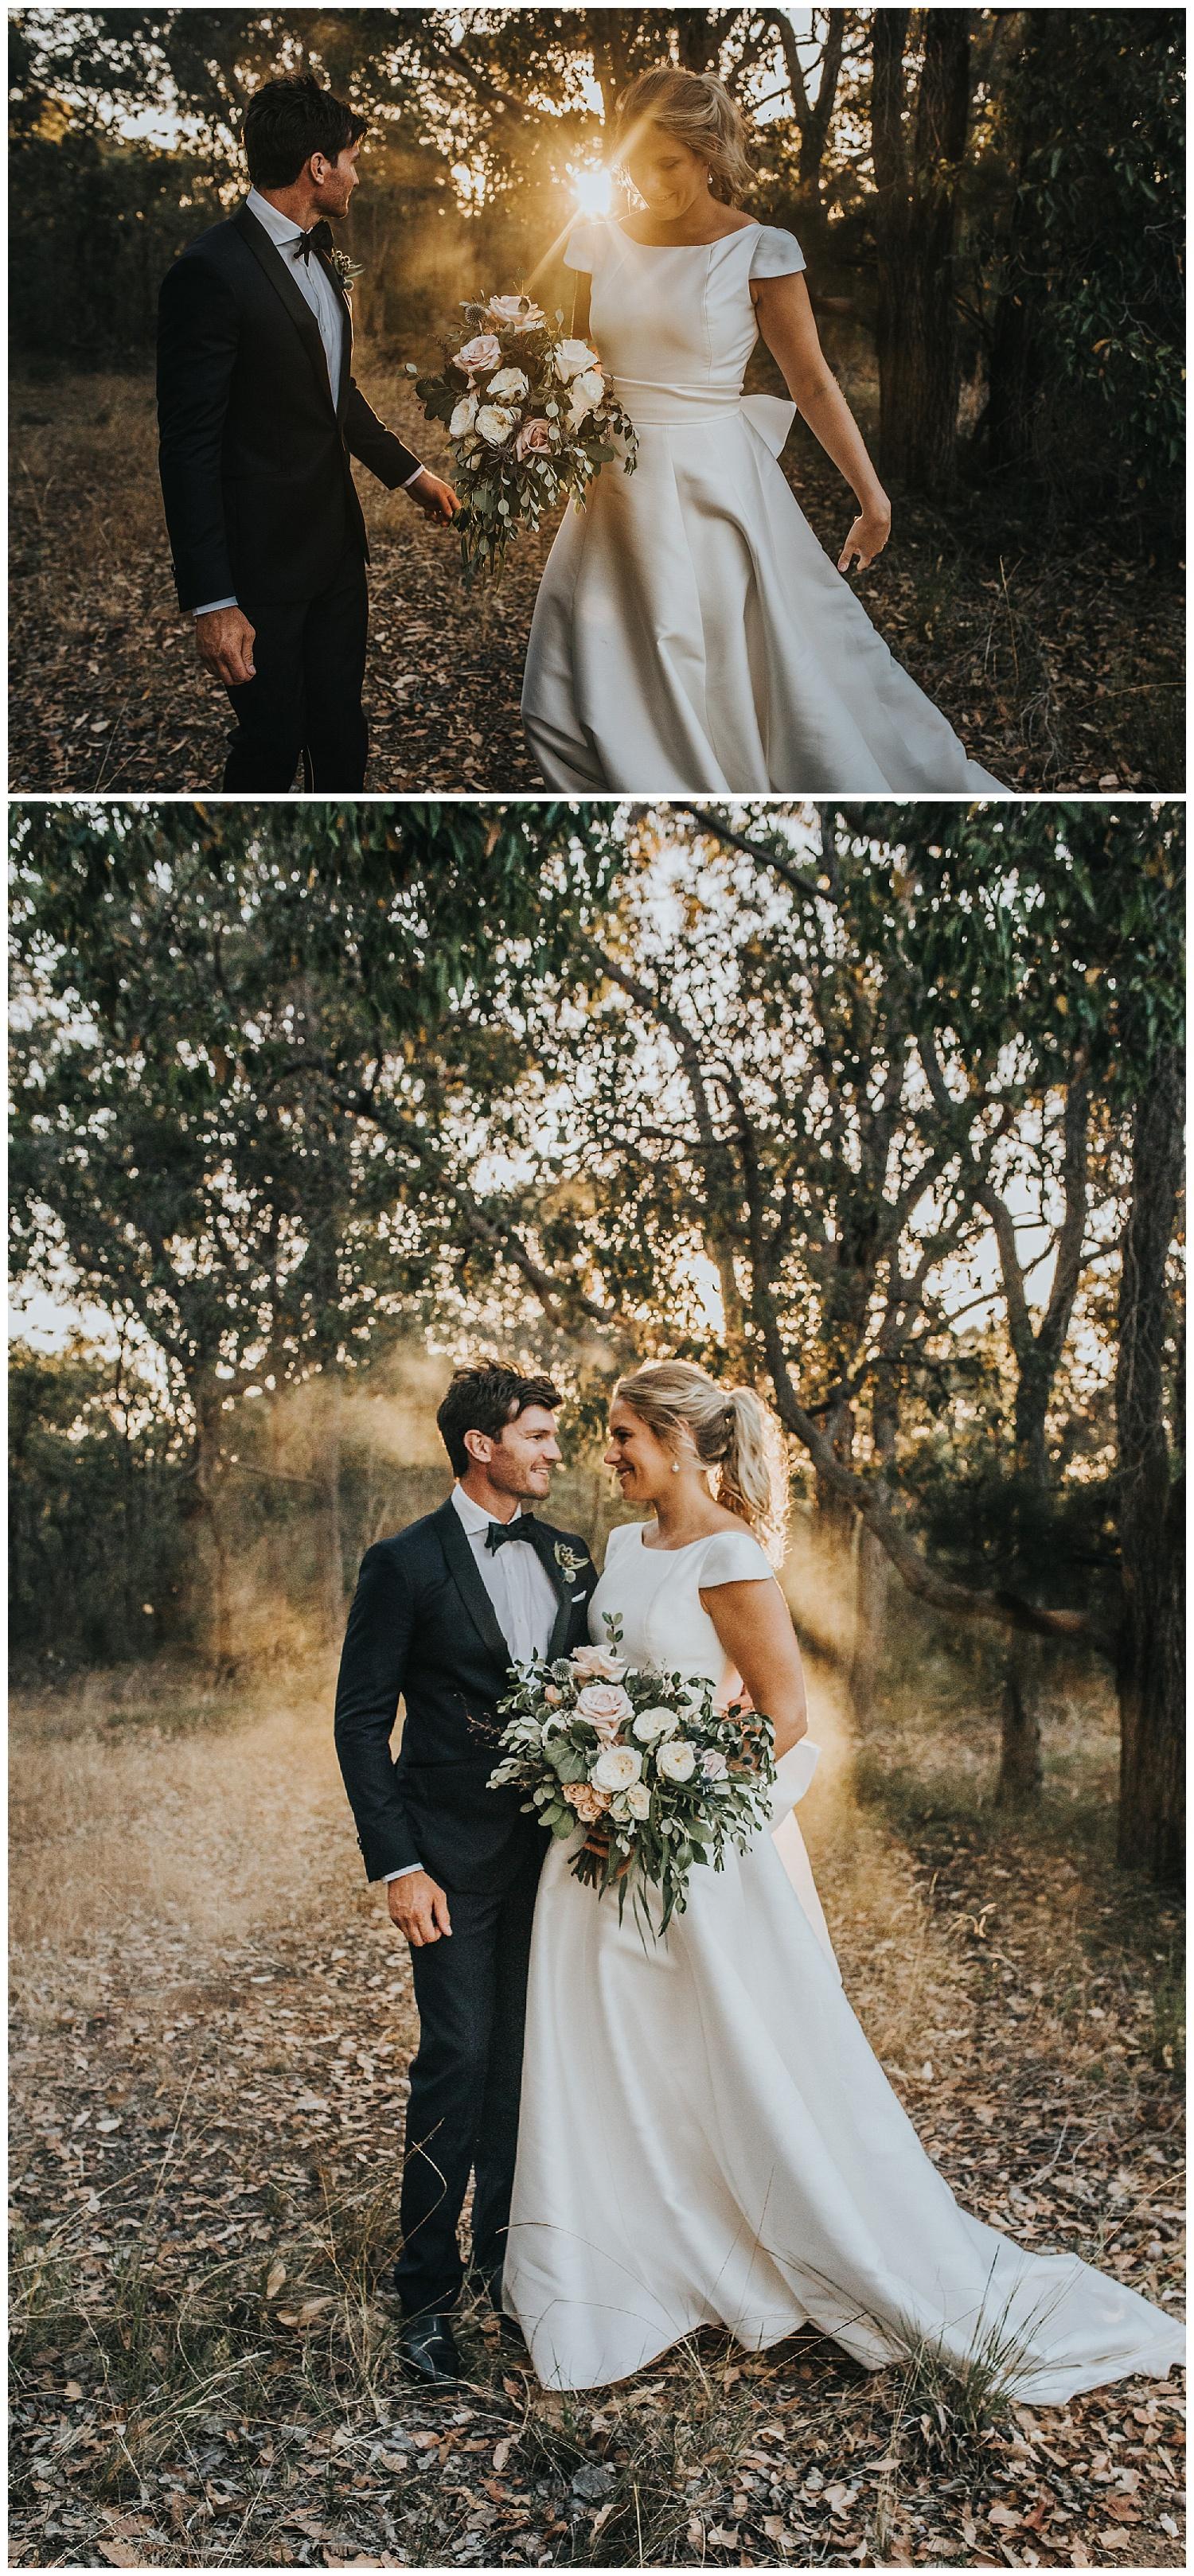 olio_bello_wedding_keeper_creative_037.JPG